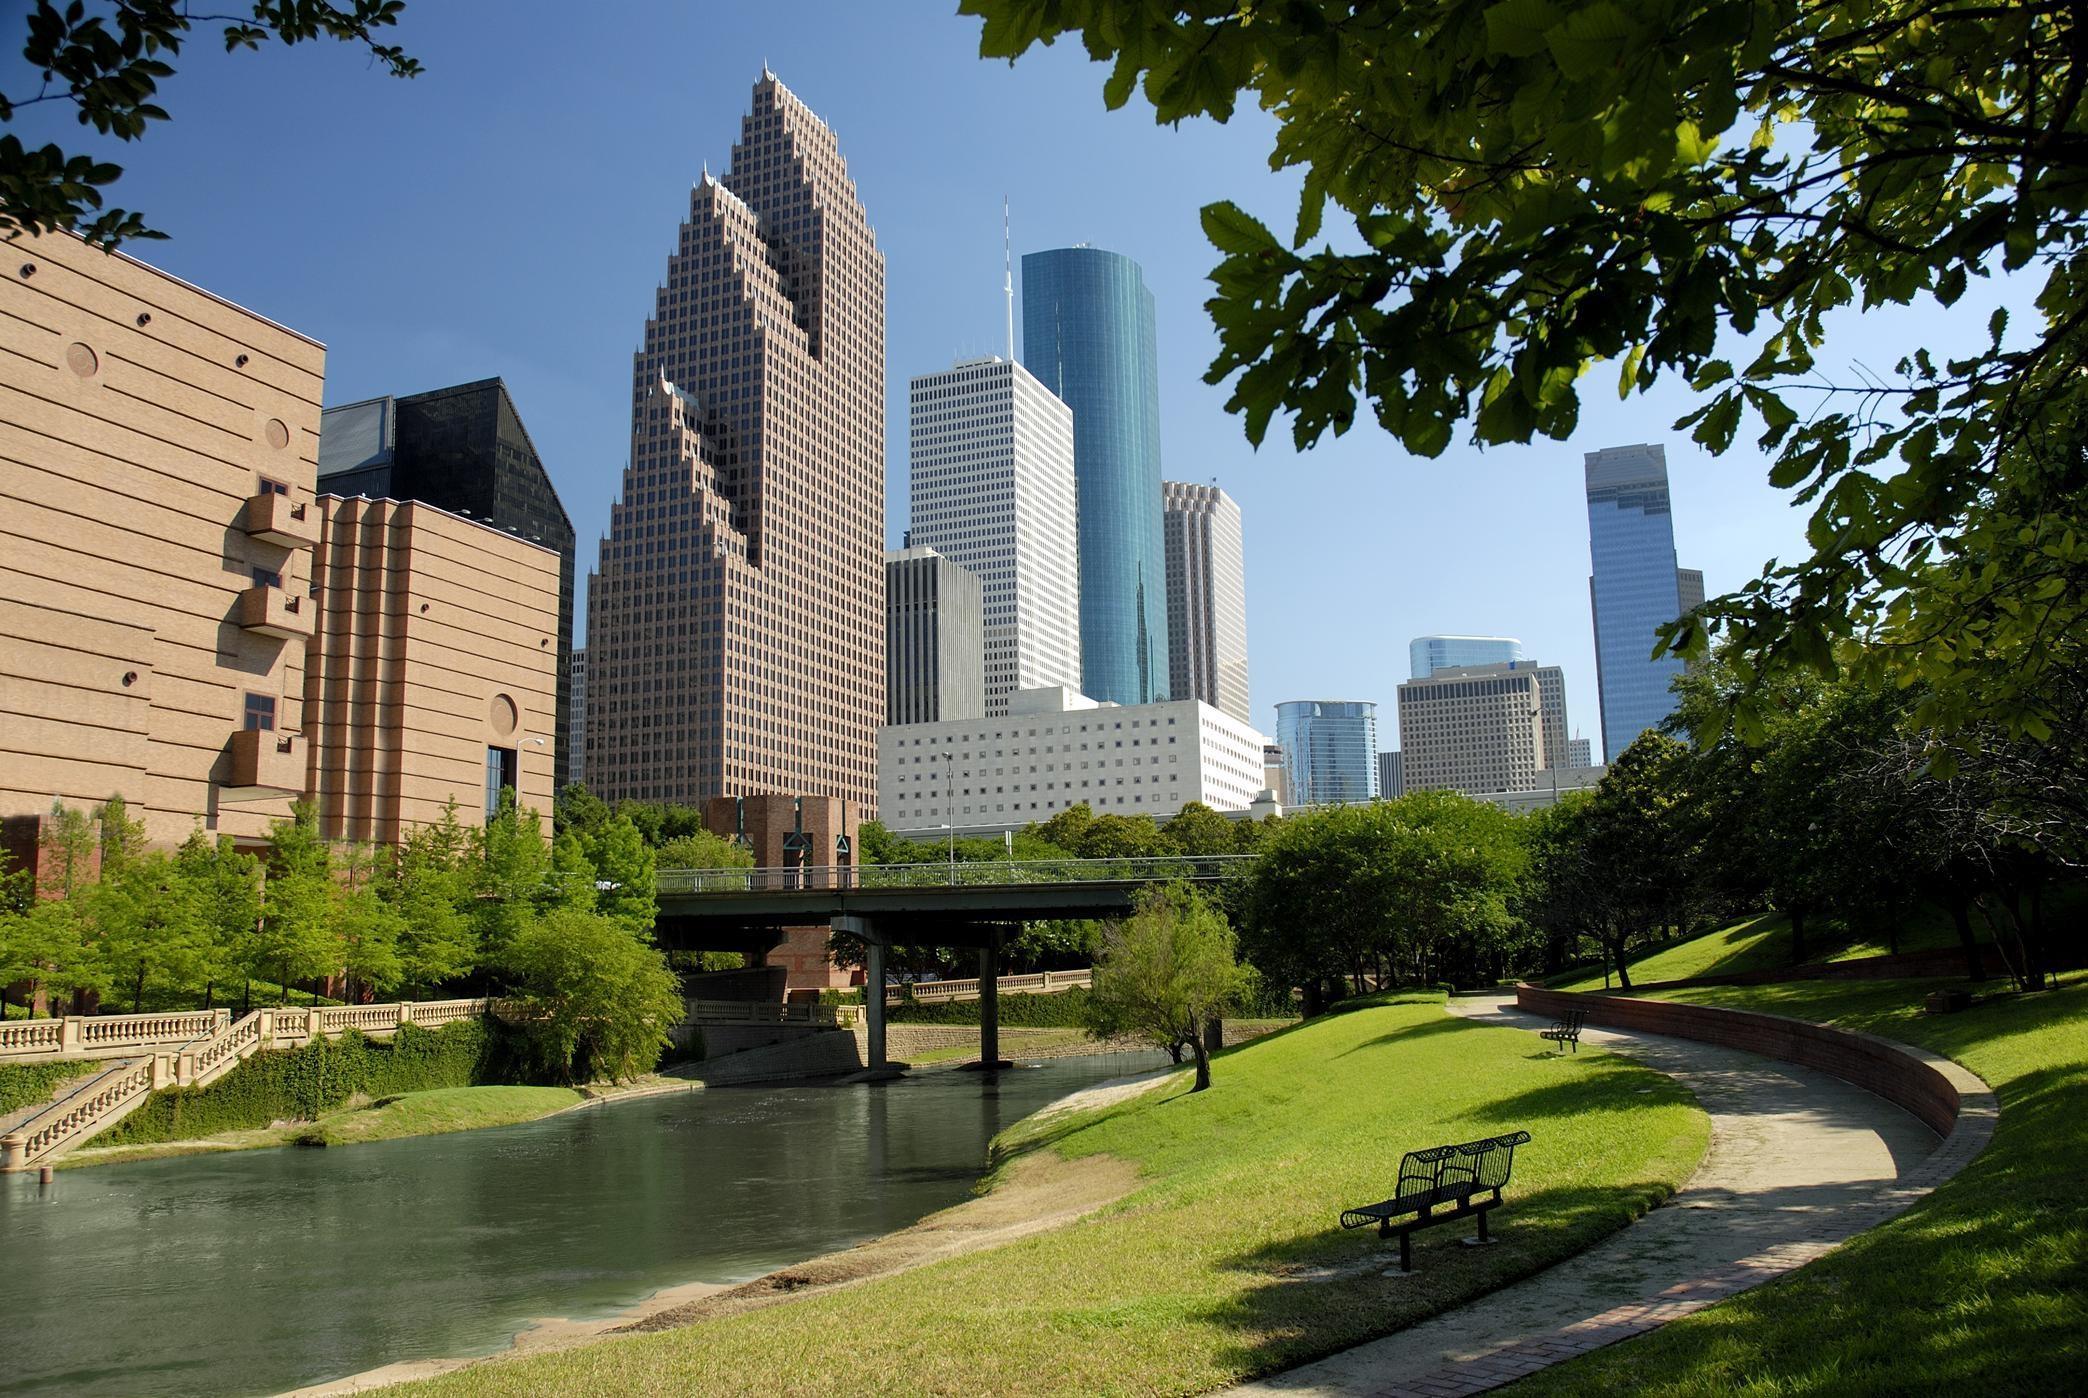 Hilton Garden Inn Houston-Pearland image 23